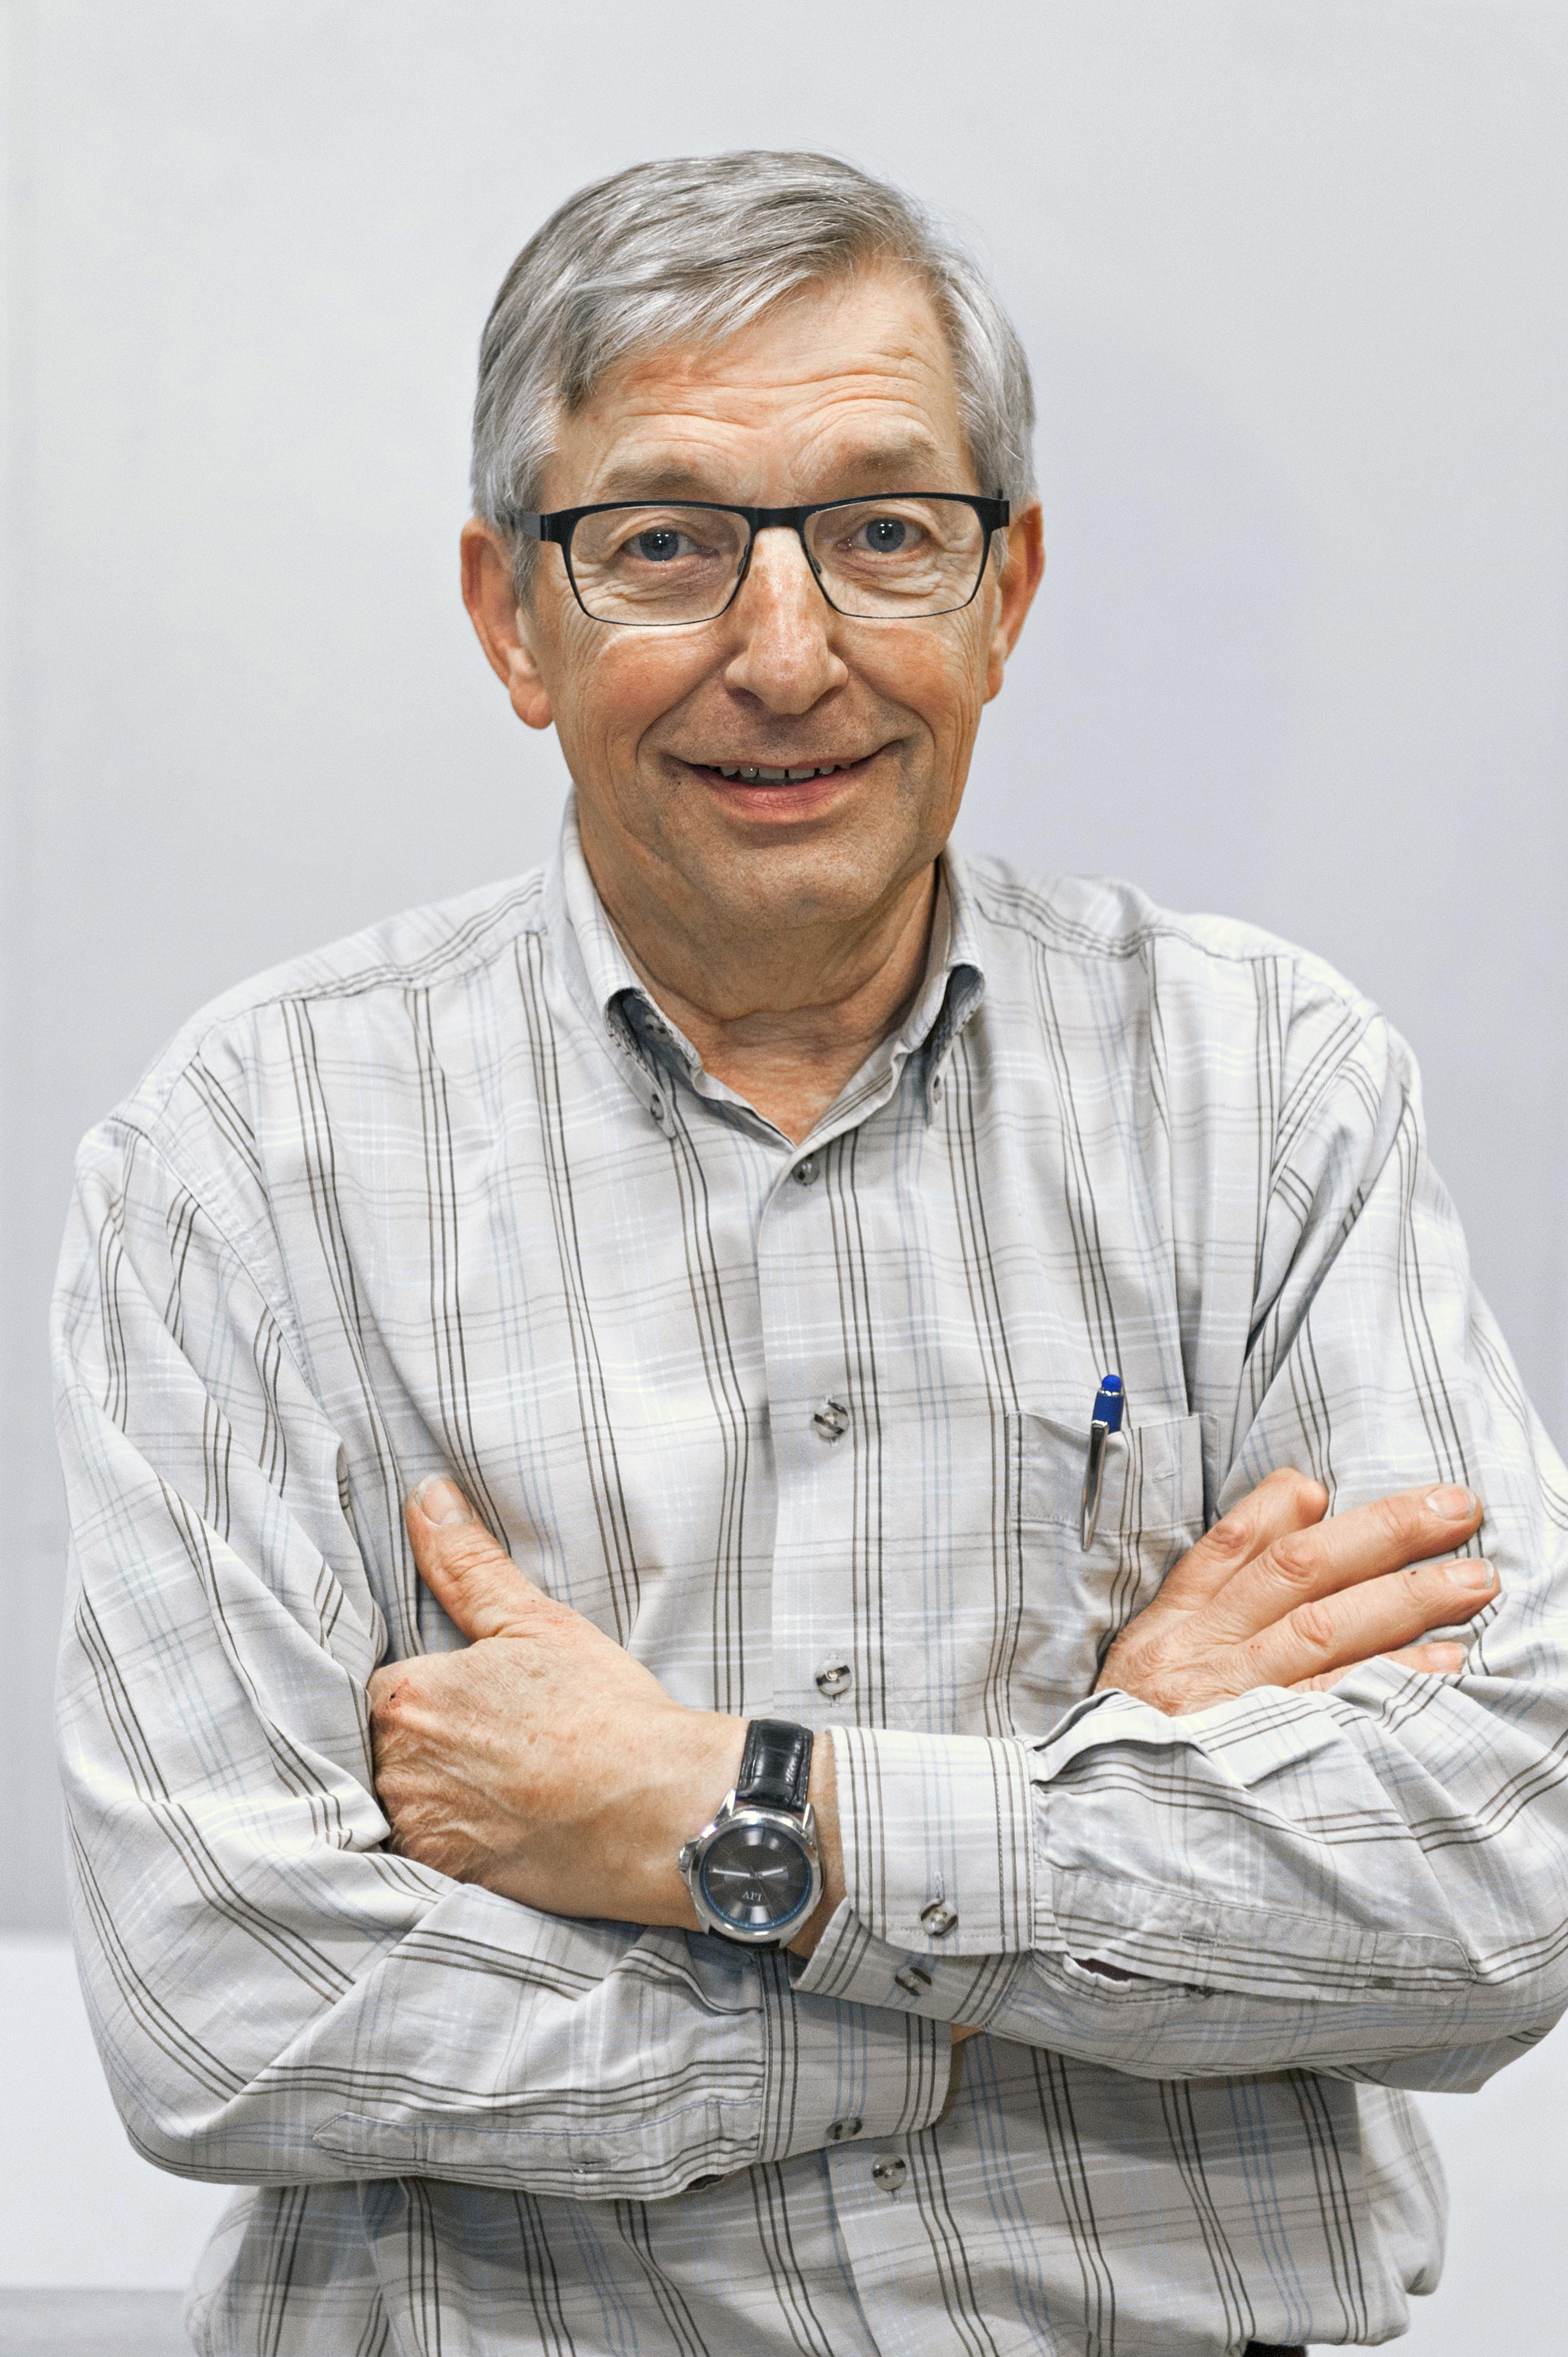 Wim Hermans